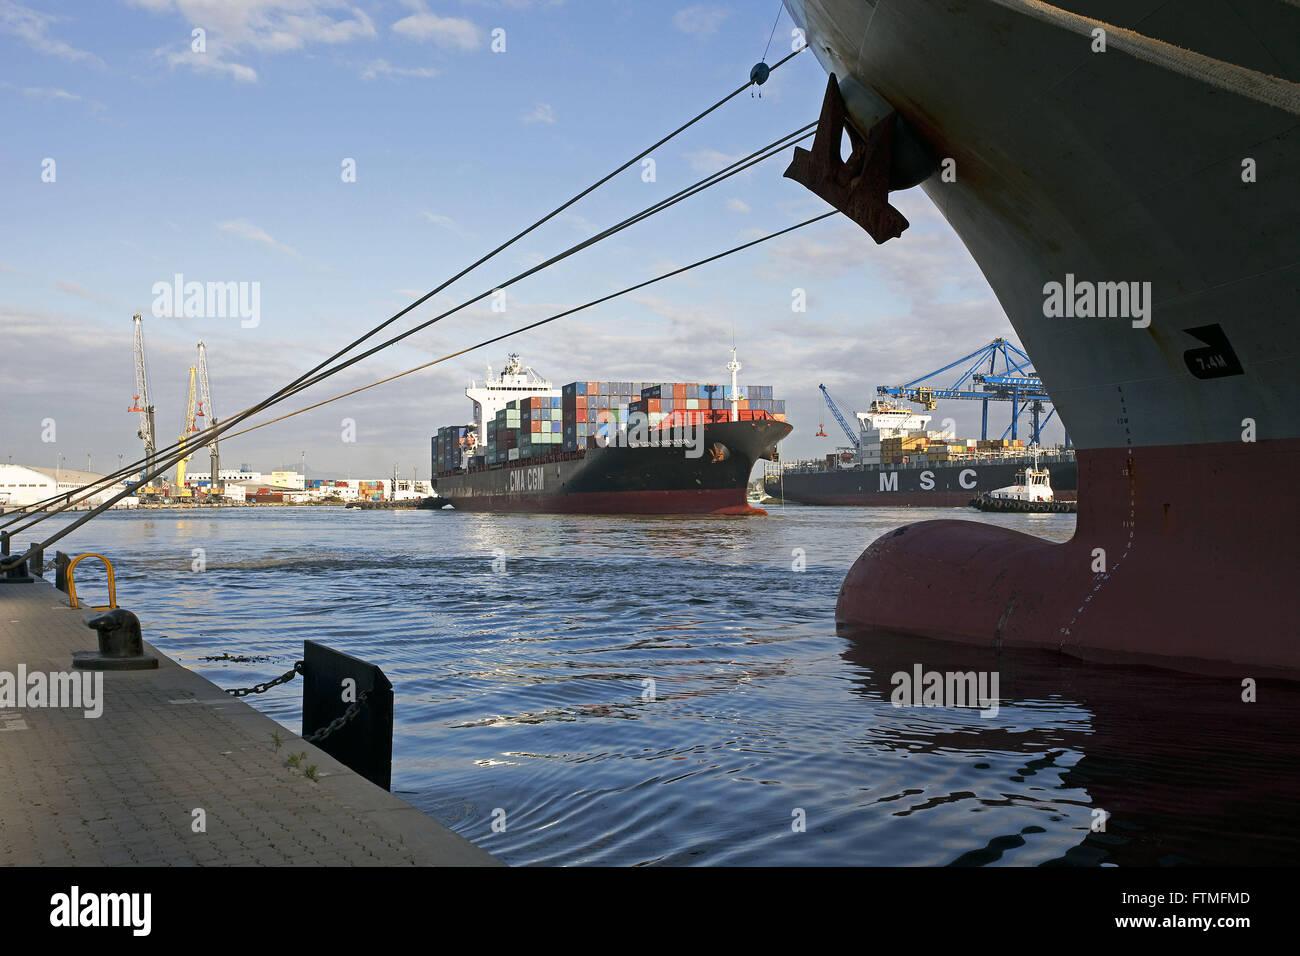 Cargo Ship Travel Europe To Usa